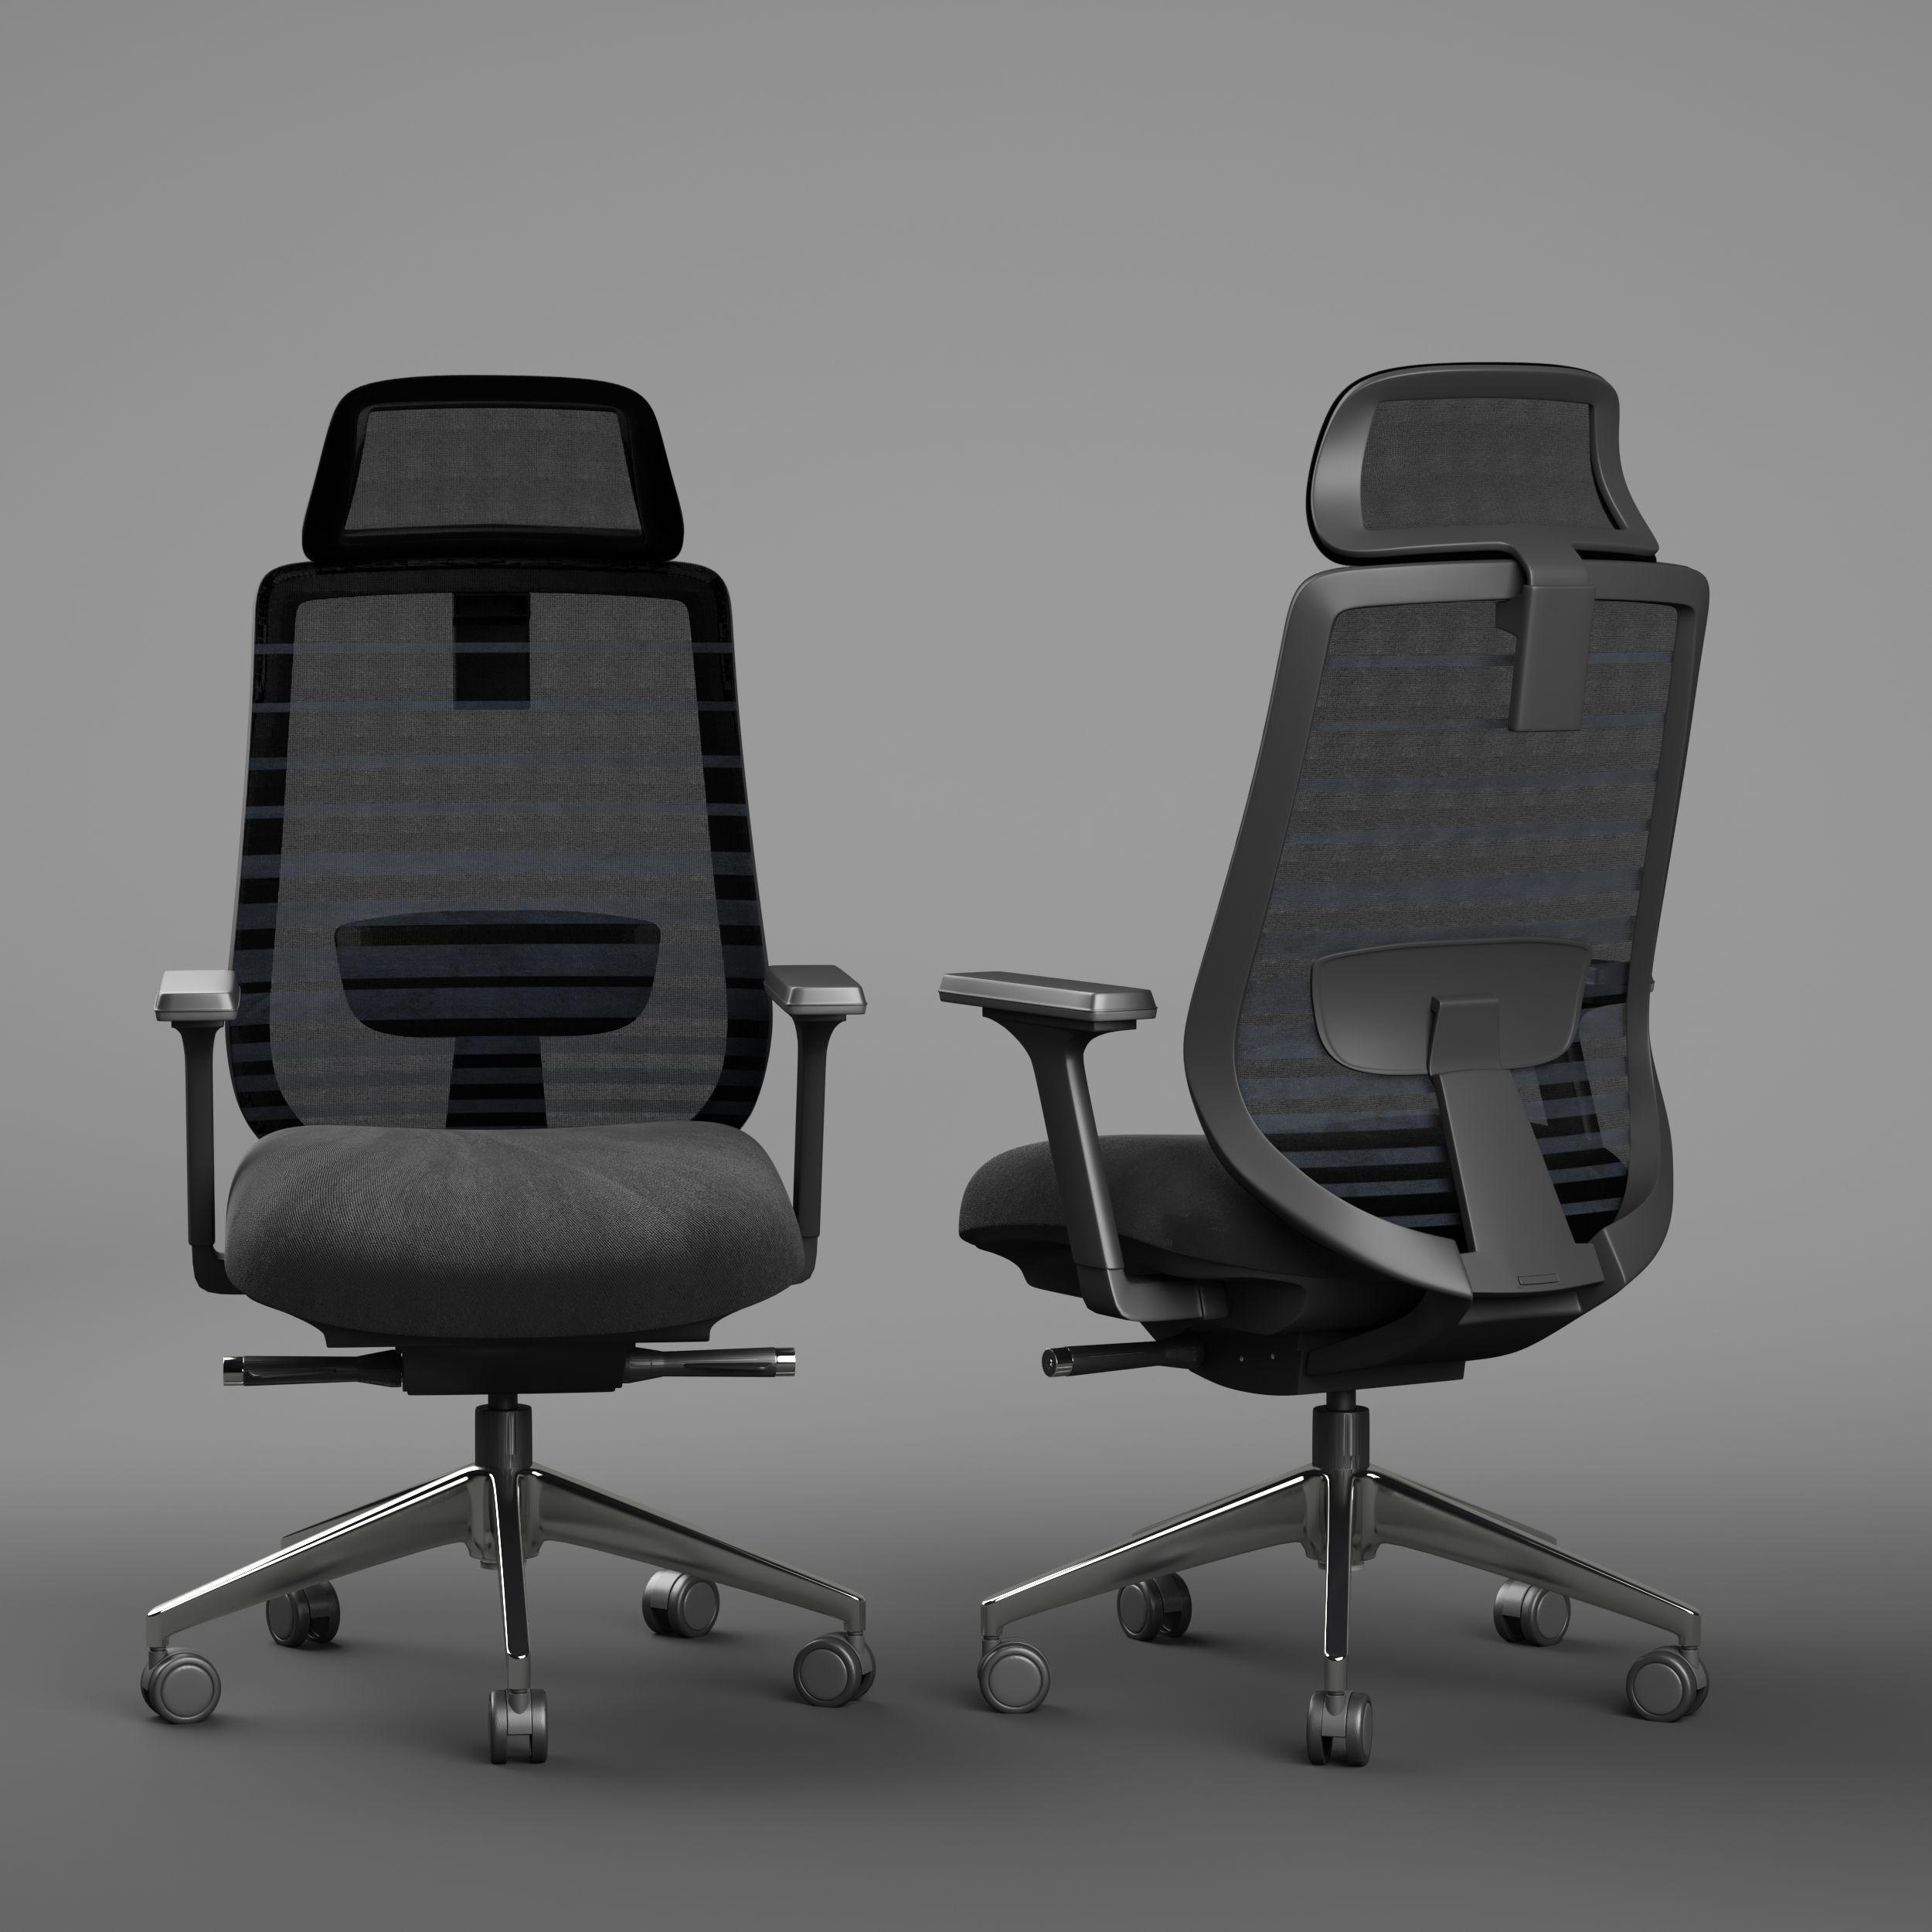 Sparta High Back Office Chair 3D model MAX BIP FBX